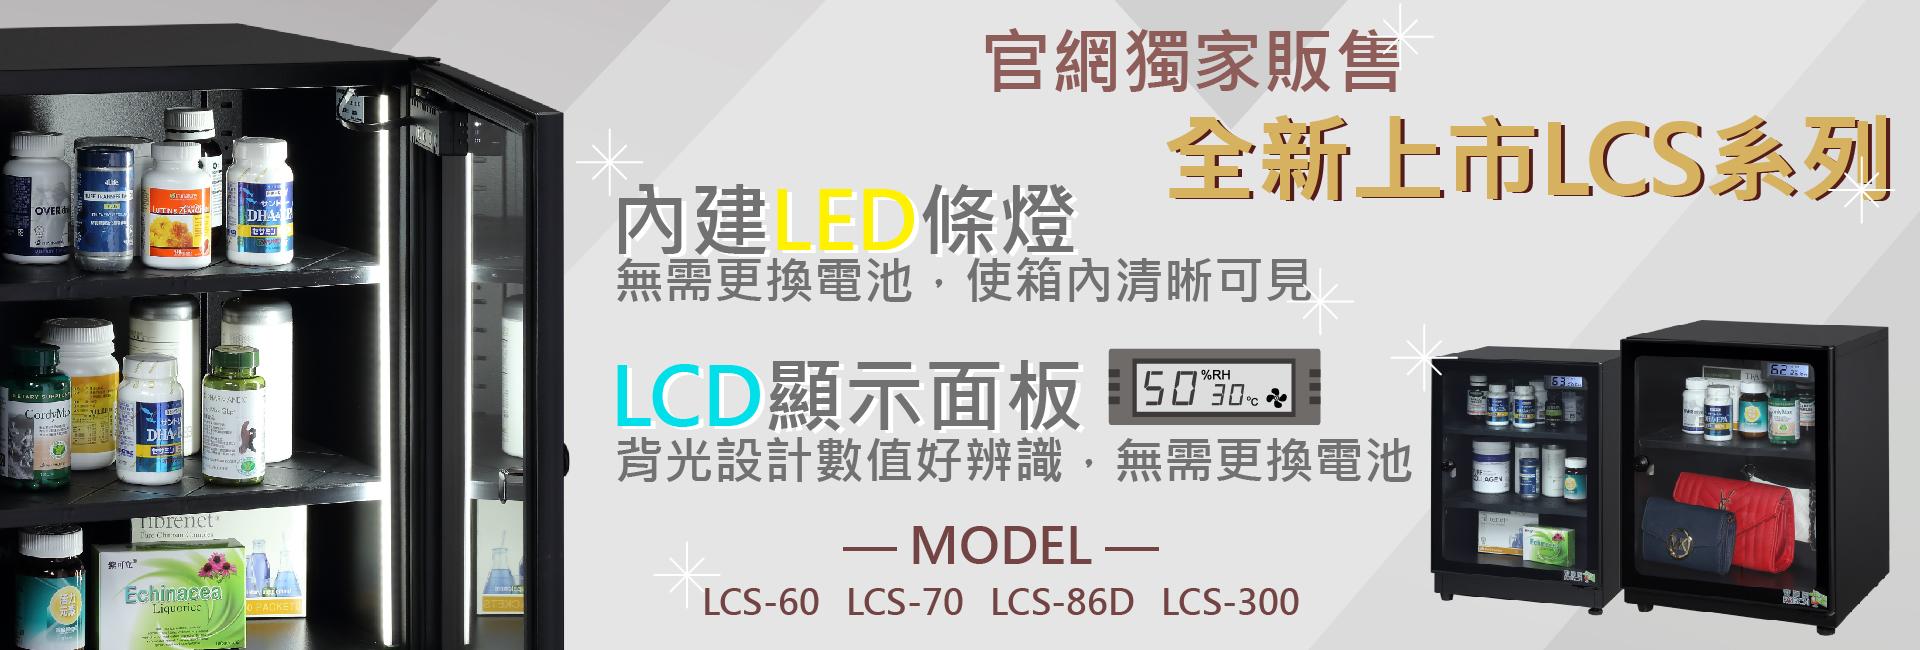 LCS系列全新上市官網獨家販售